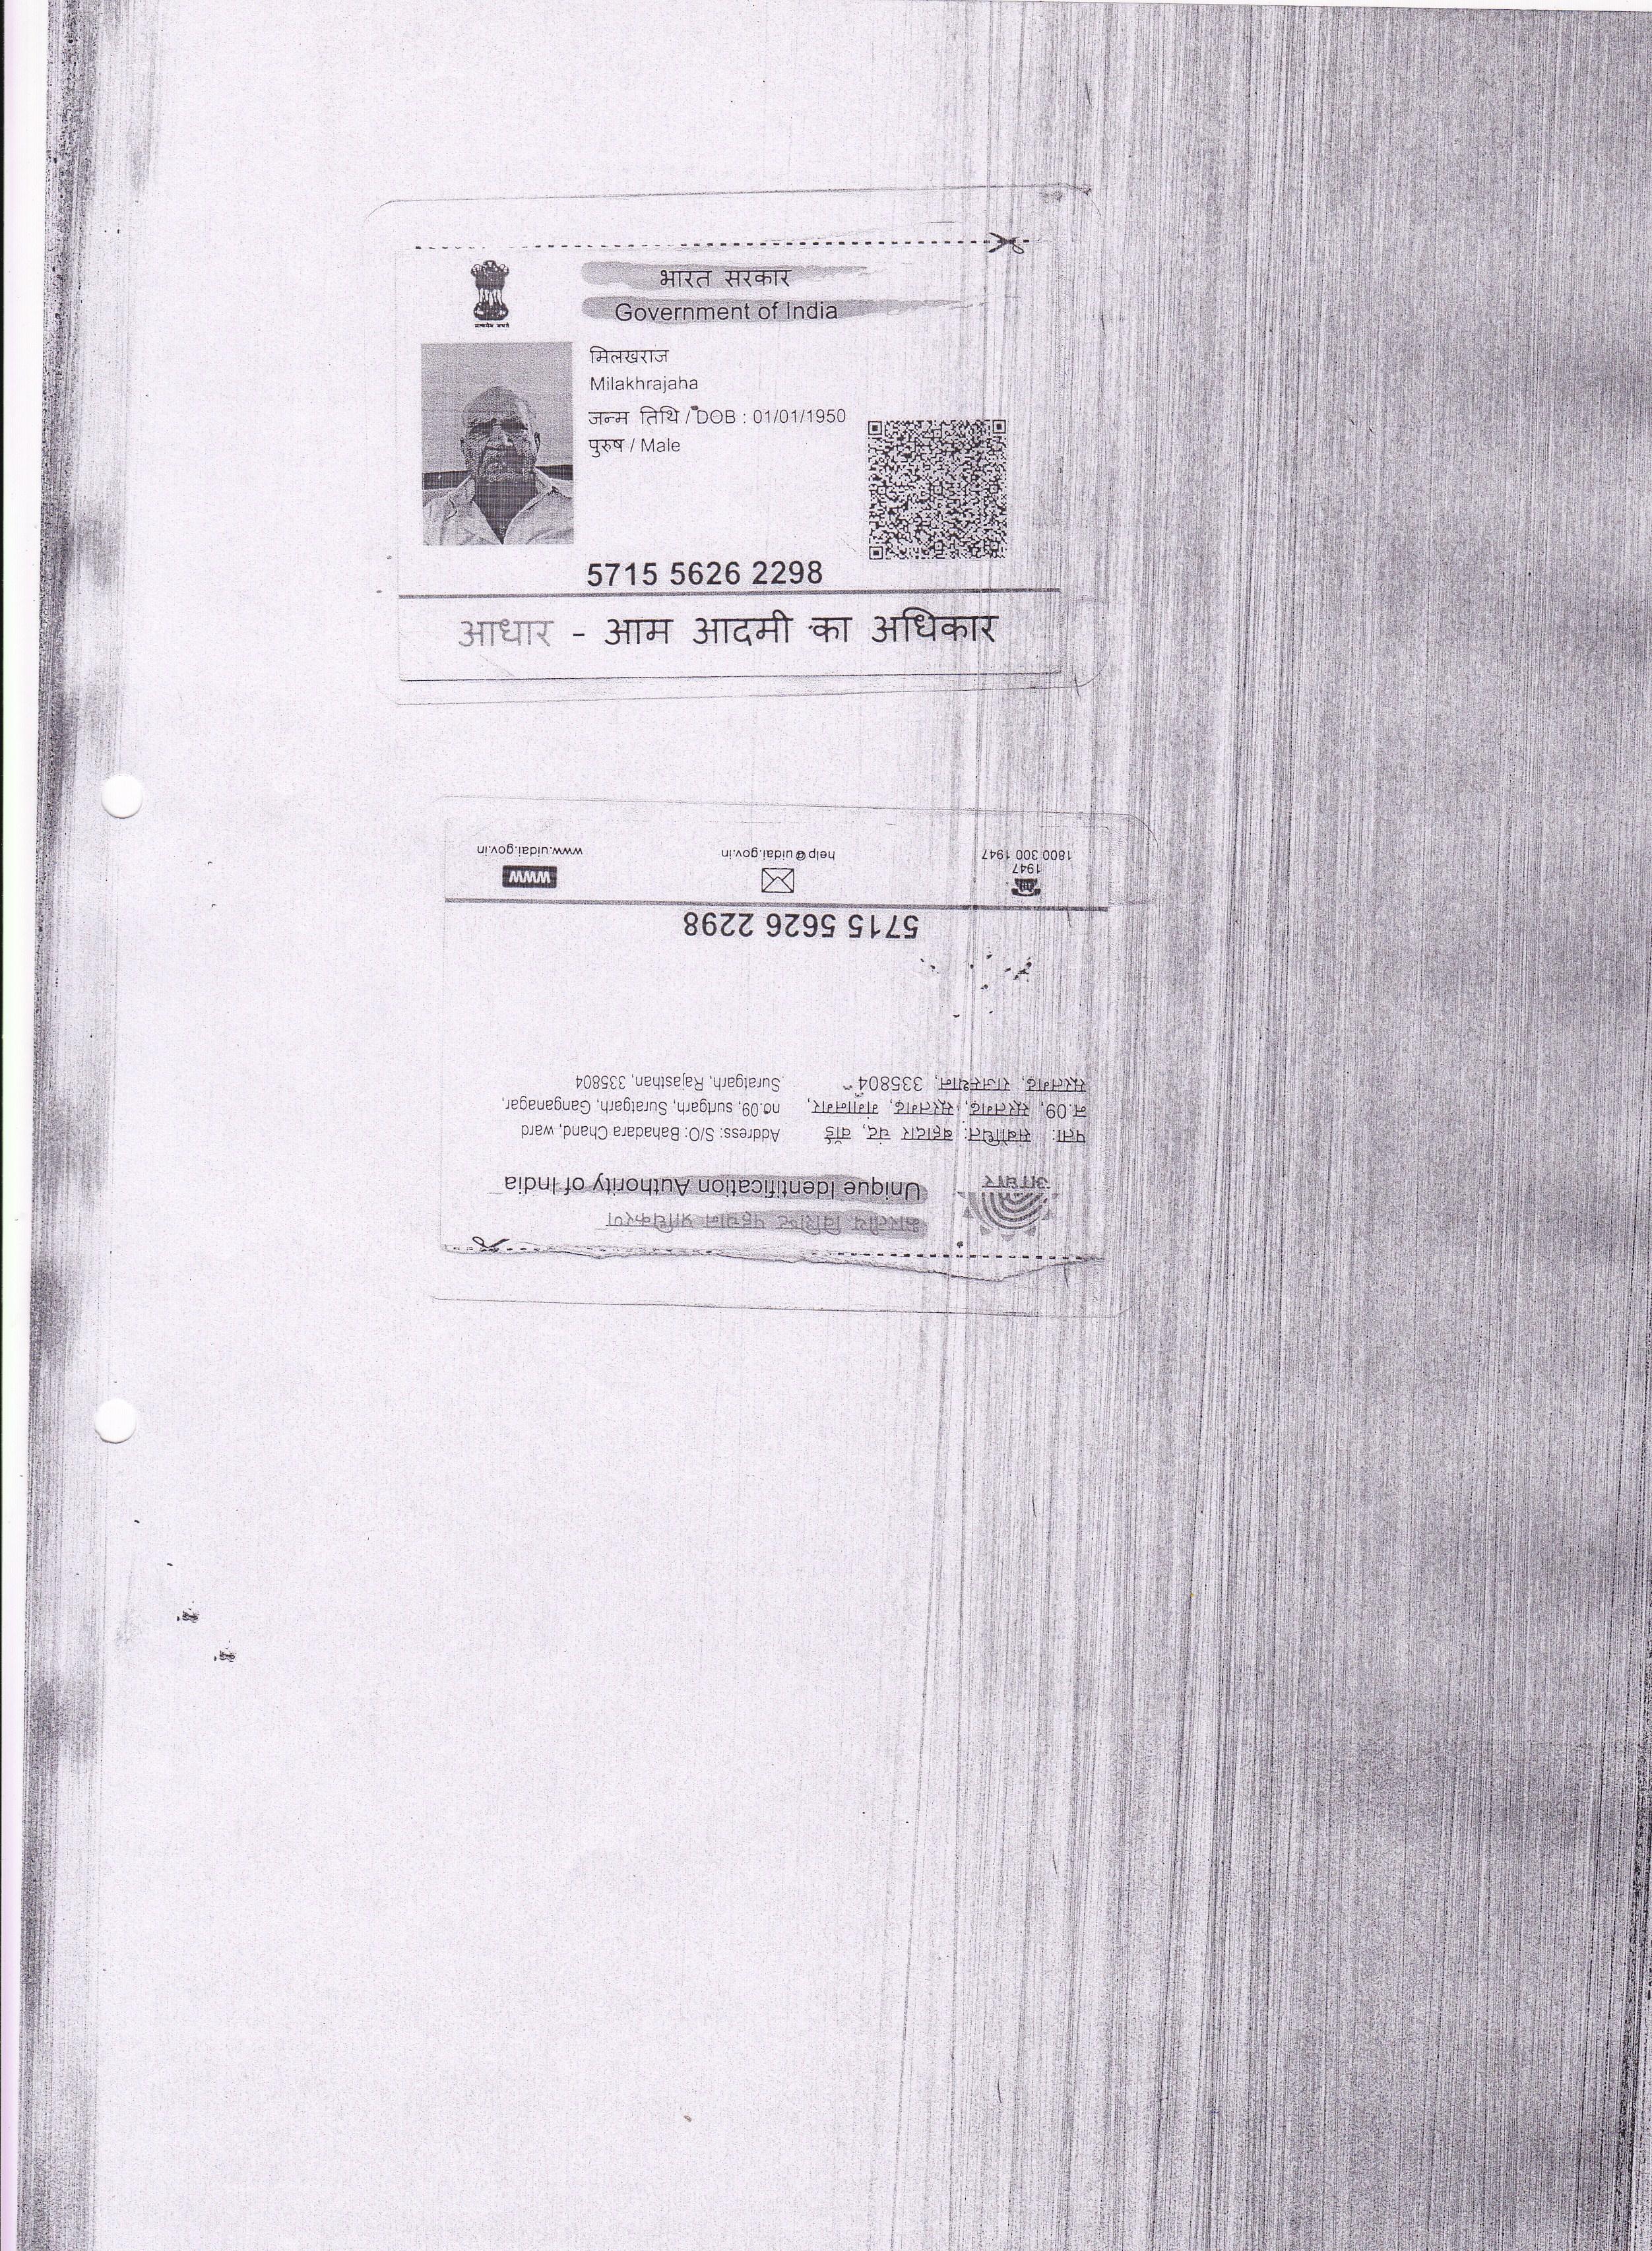 Milkh-Raj-Arora-68Yrs-esophagus-cancer-oral-cancer-Patient-Treattment-Reports